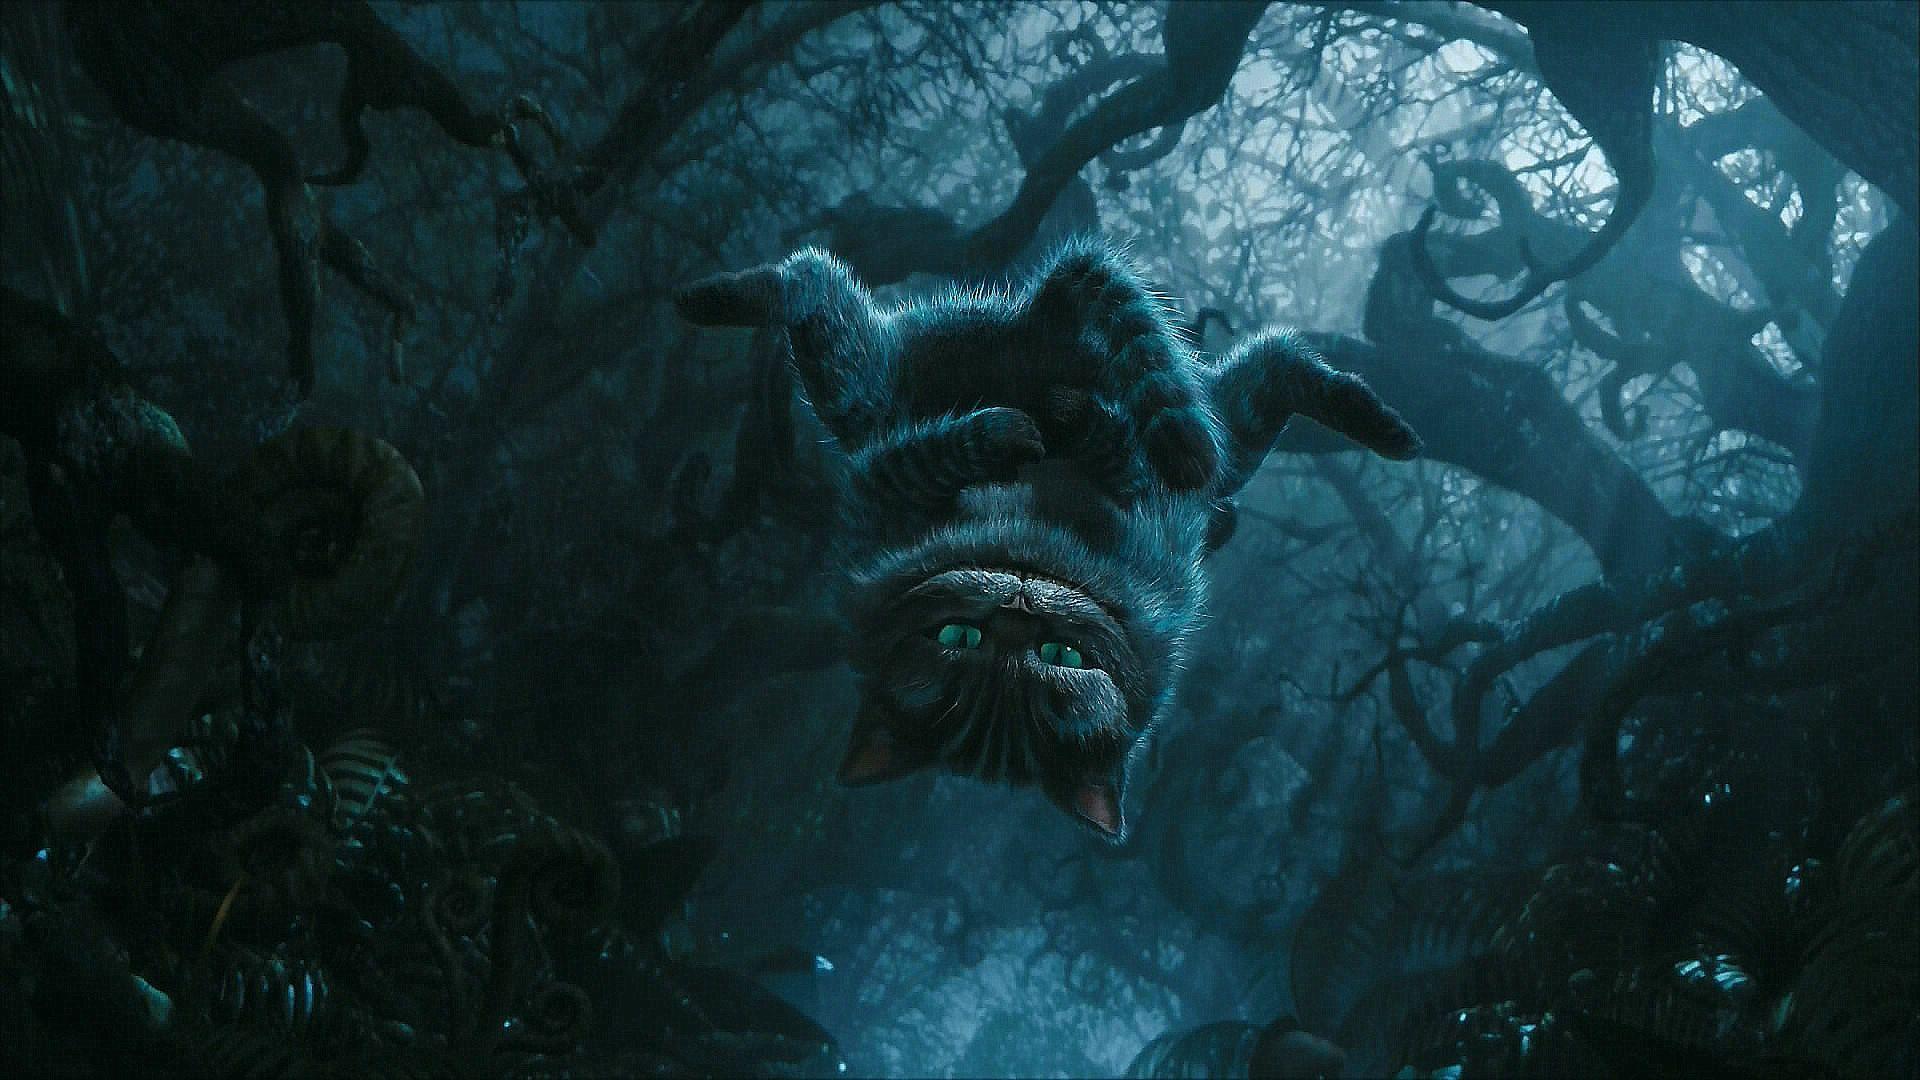 Cheshire Cat Alice In Wonderland Movie Desktop Wallpaper